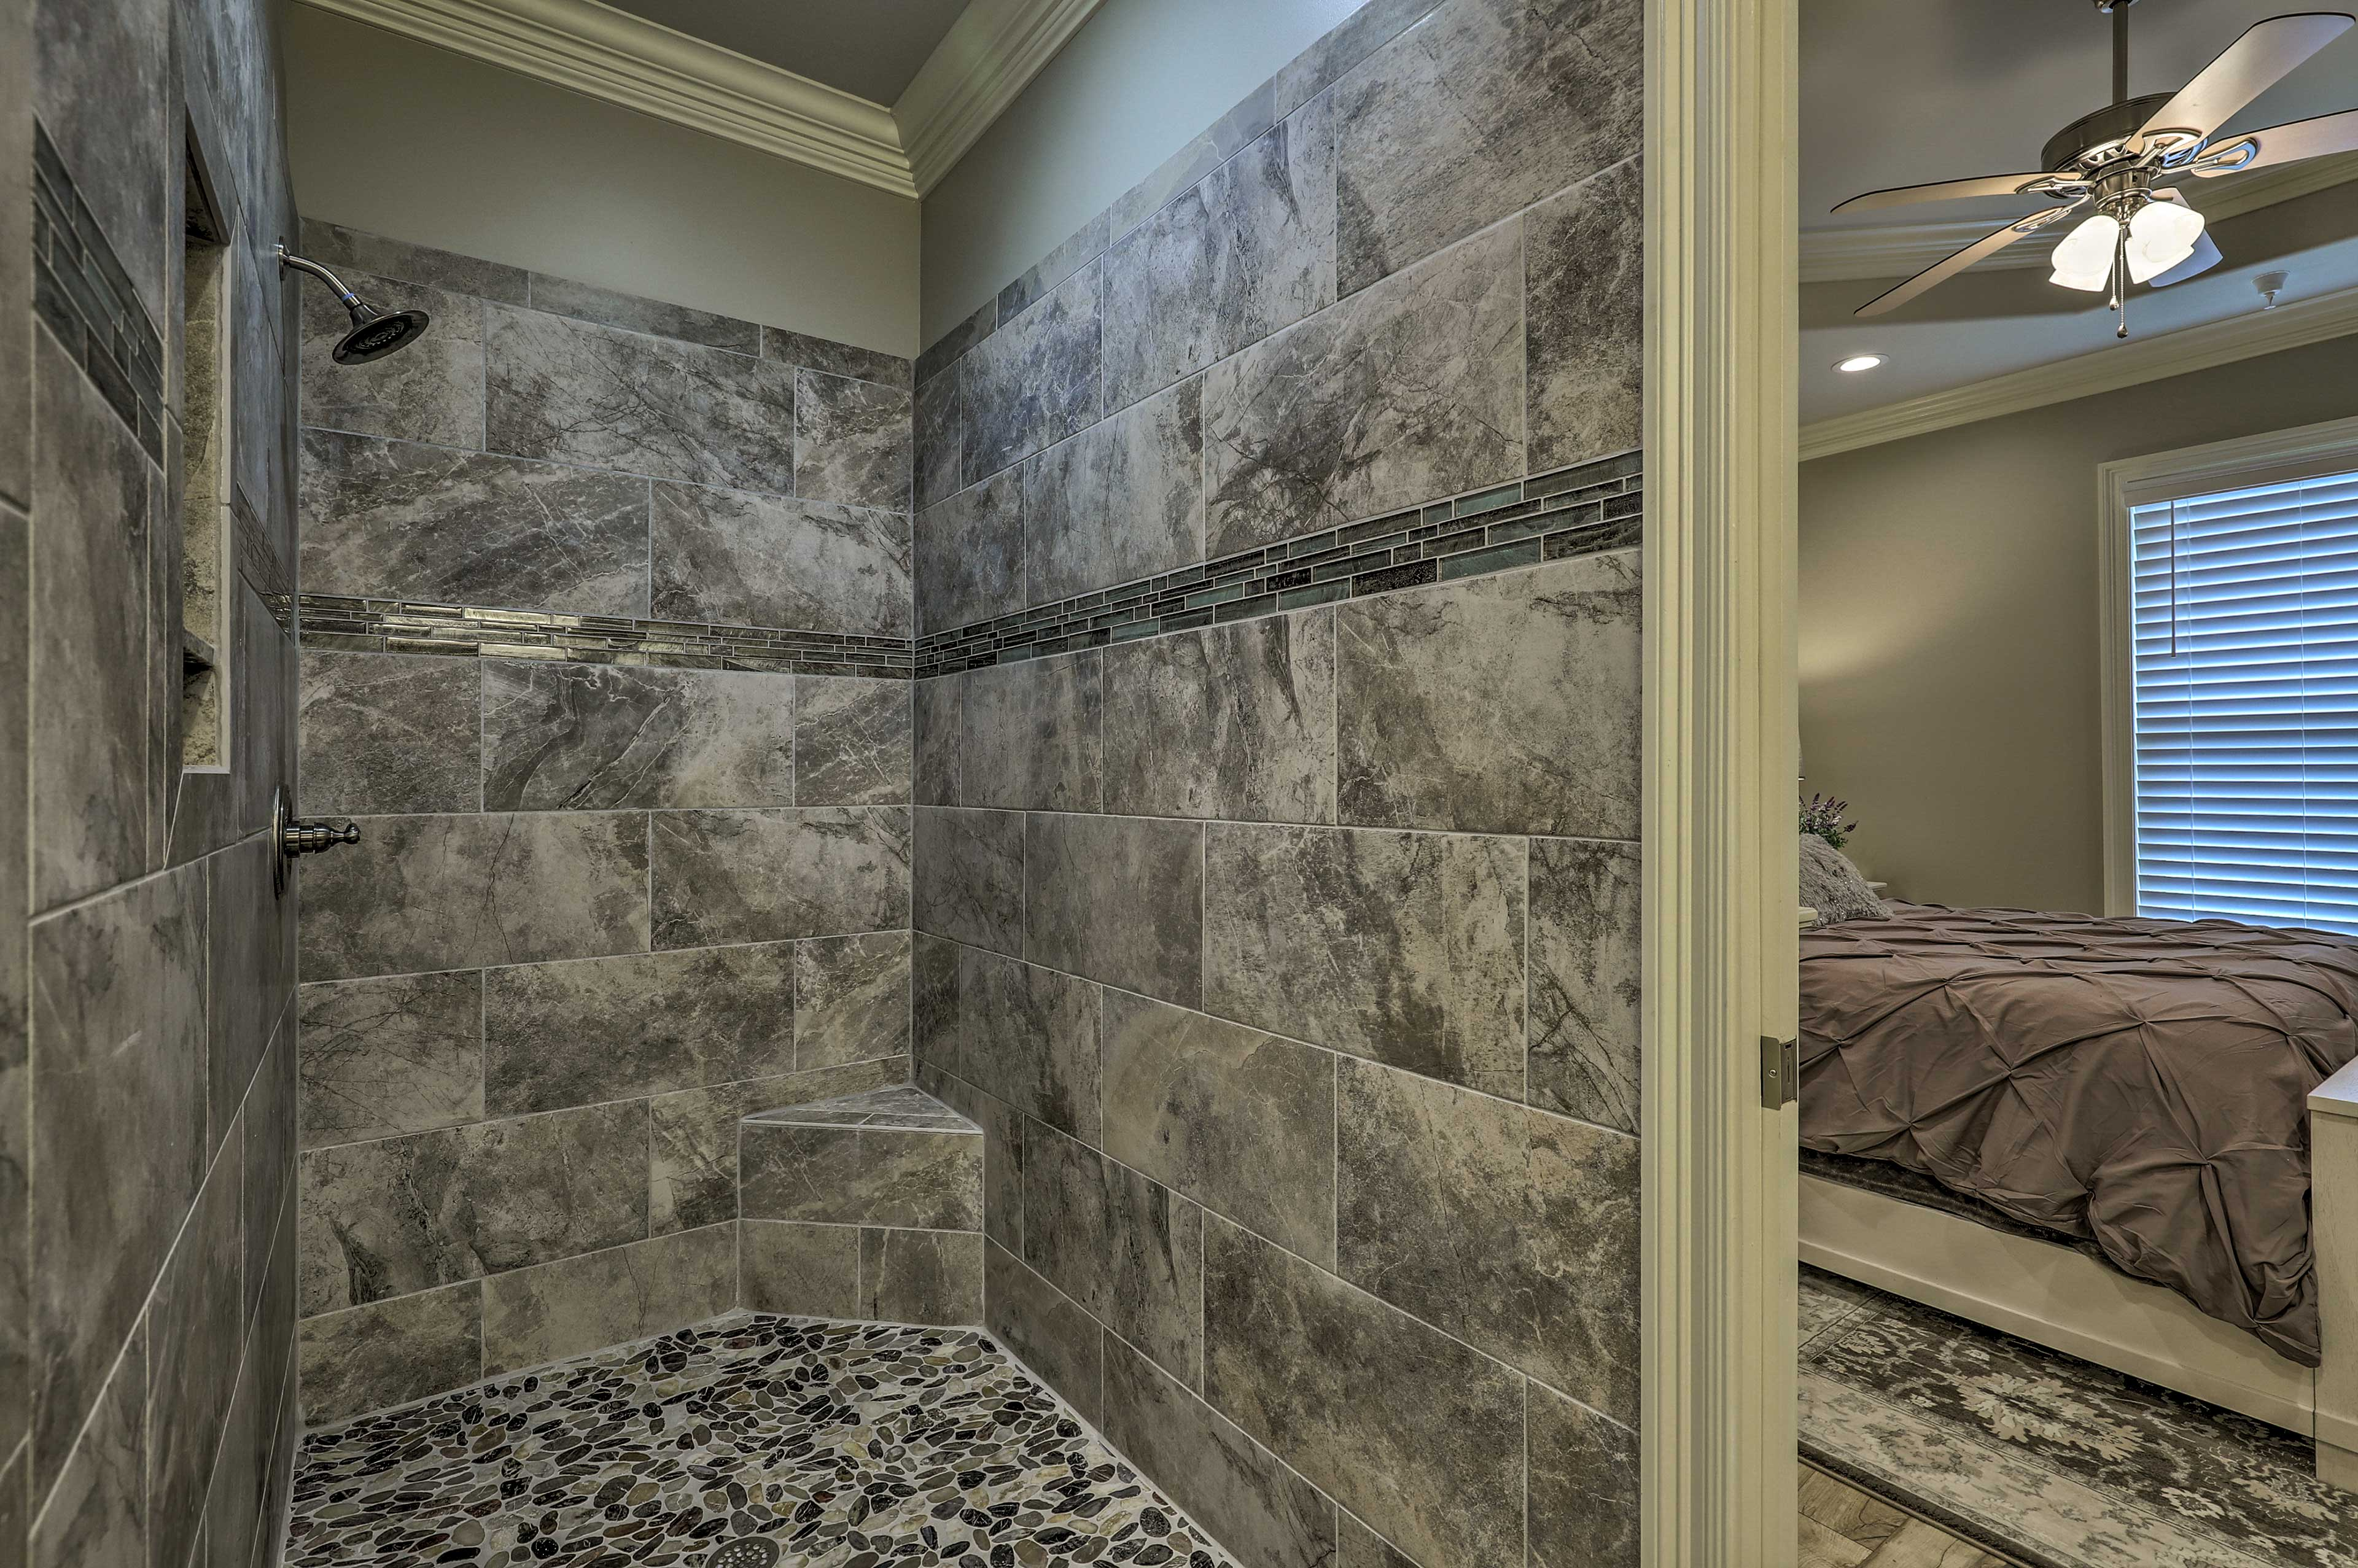 Rinse off in this luxurious, doorless shower!